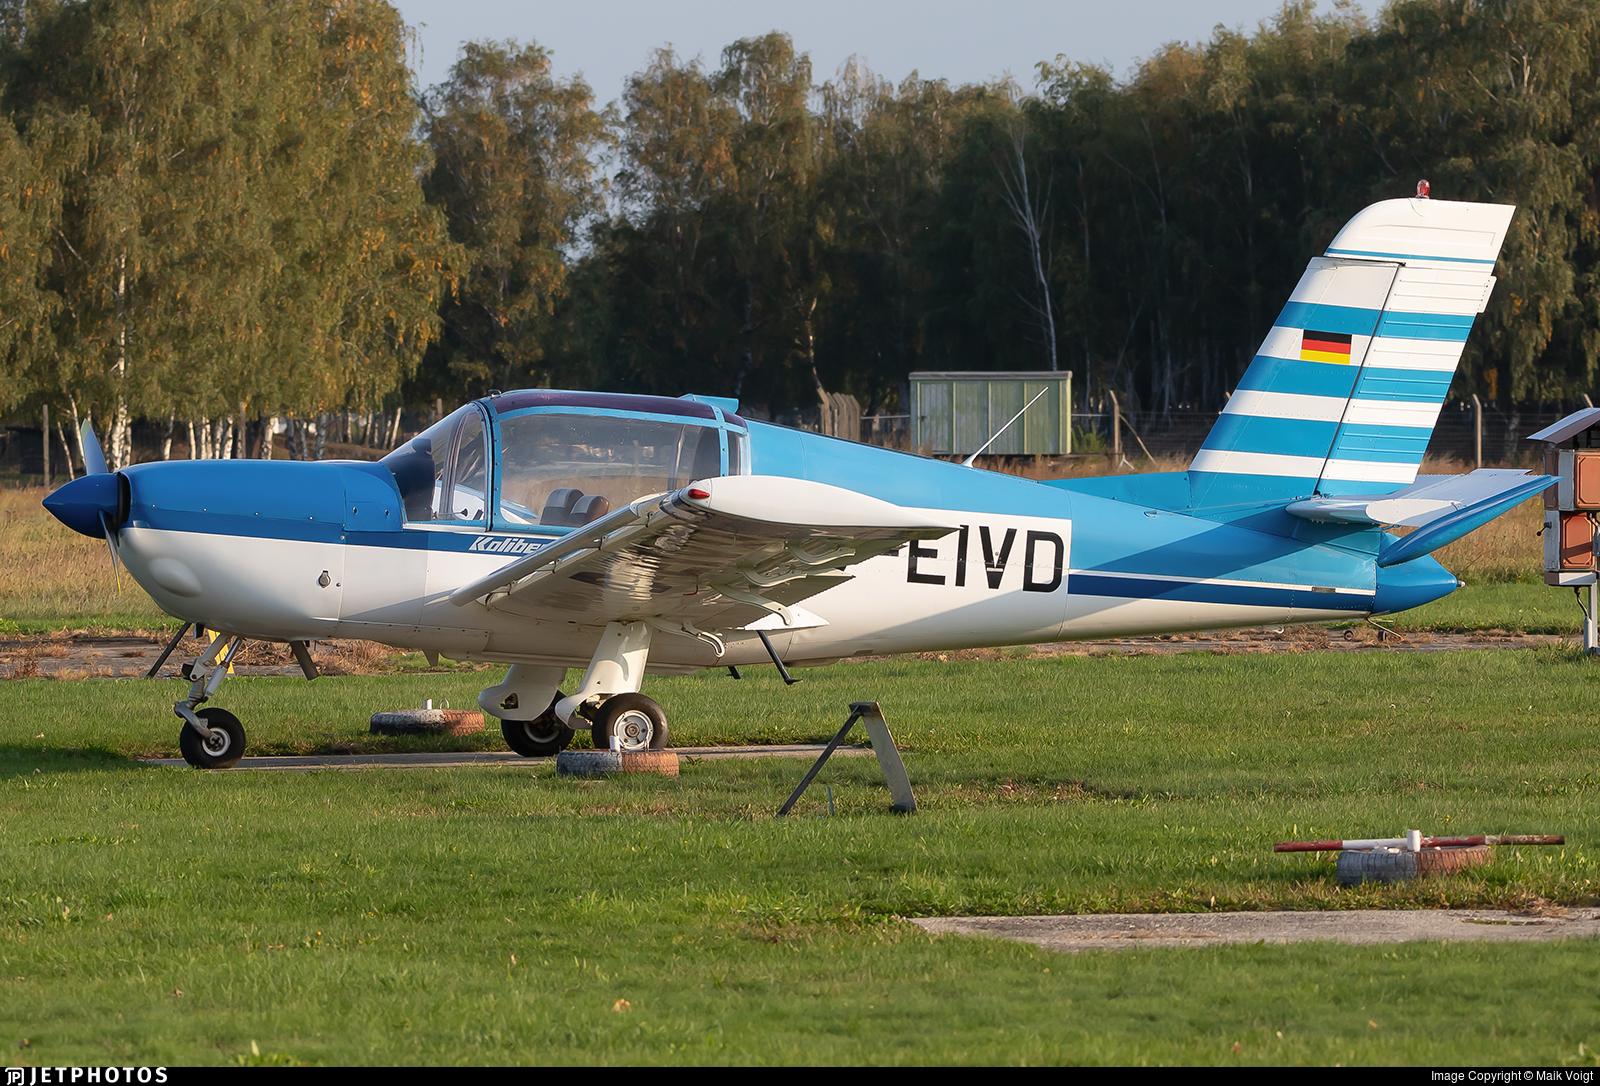 D-EIVD - PZL-Okecie 110 Koliber 150 - Private